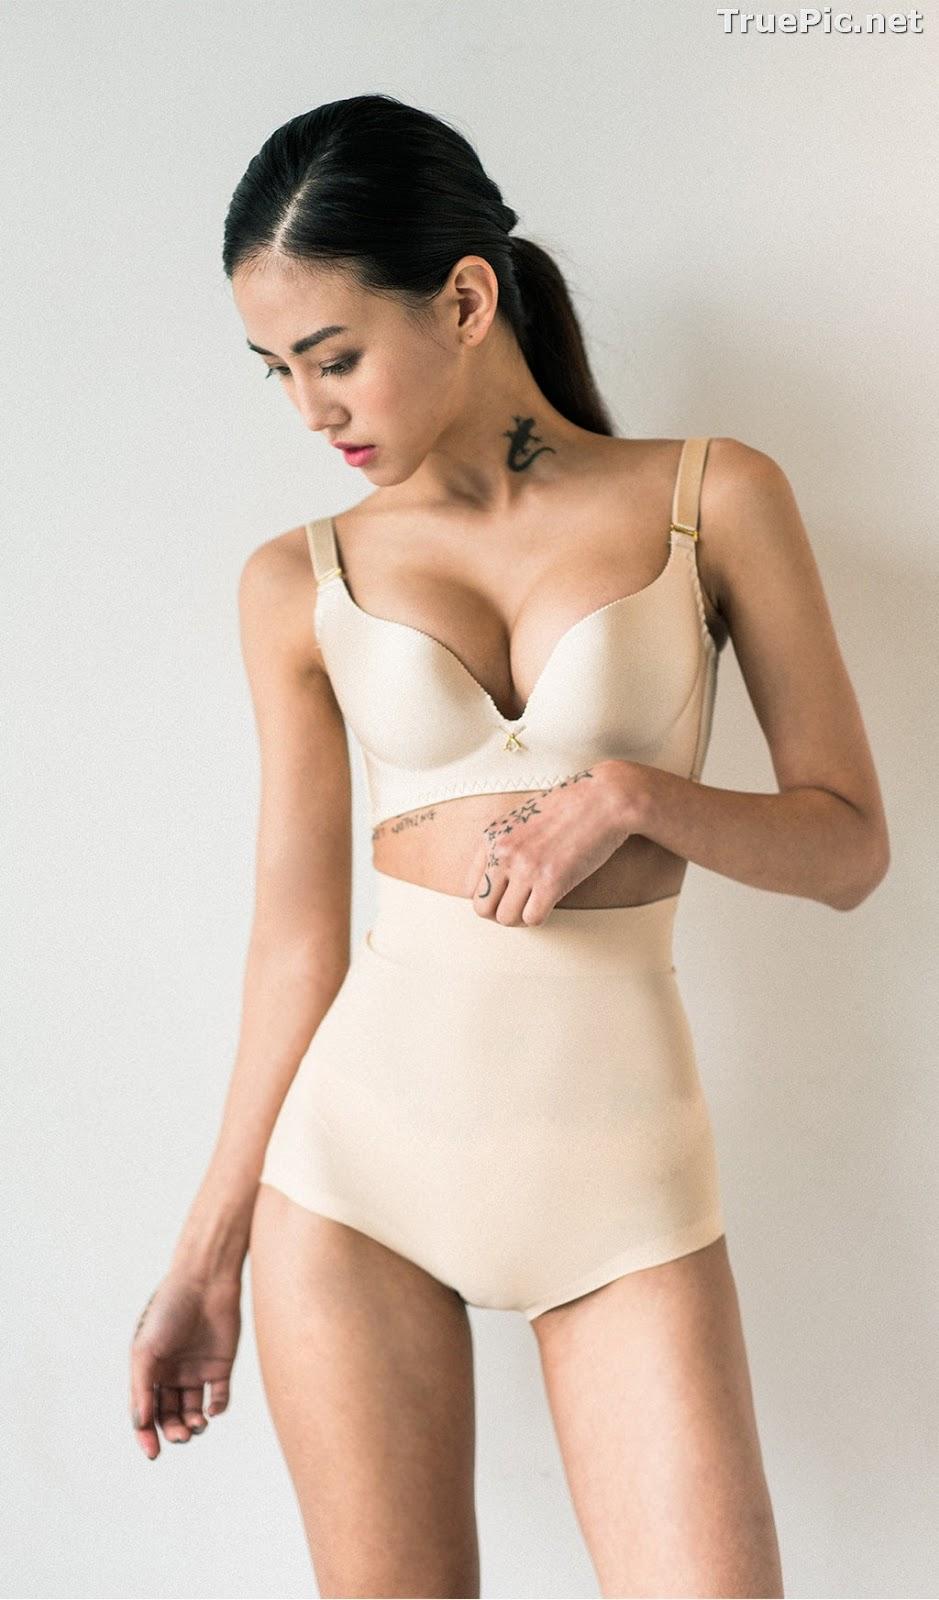 Image Korean Fashion Model – Baek Ye Jin – Sexy Lingerie Collection #5 - TruePic.net - Picture-3